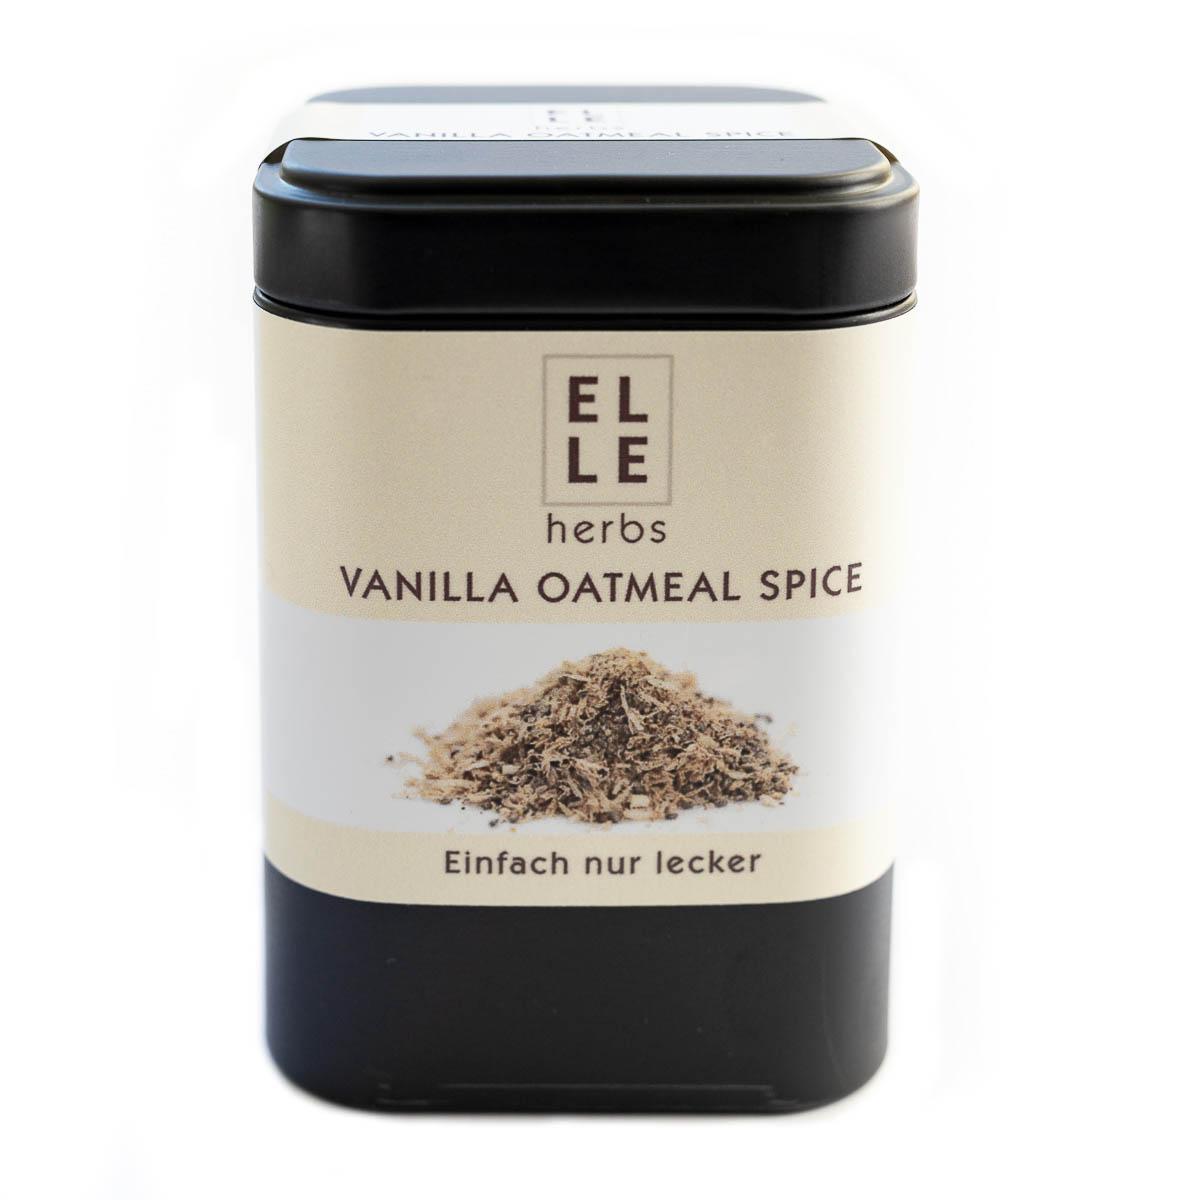 Vanilla Oatmeal Spice von Elle Herbs